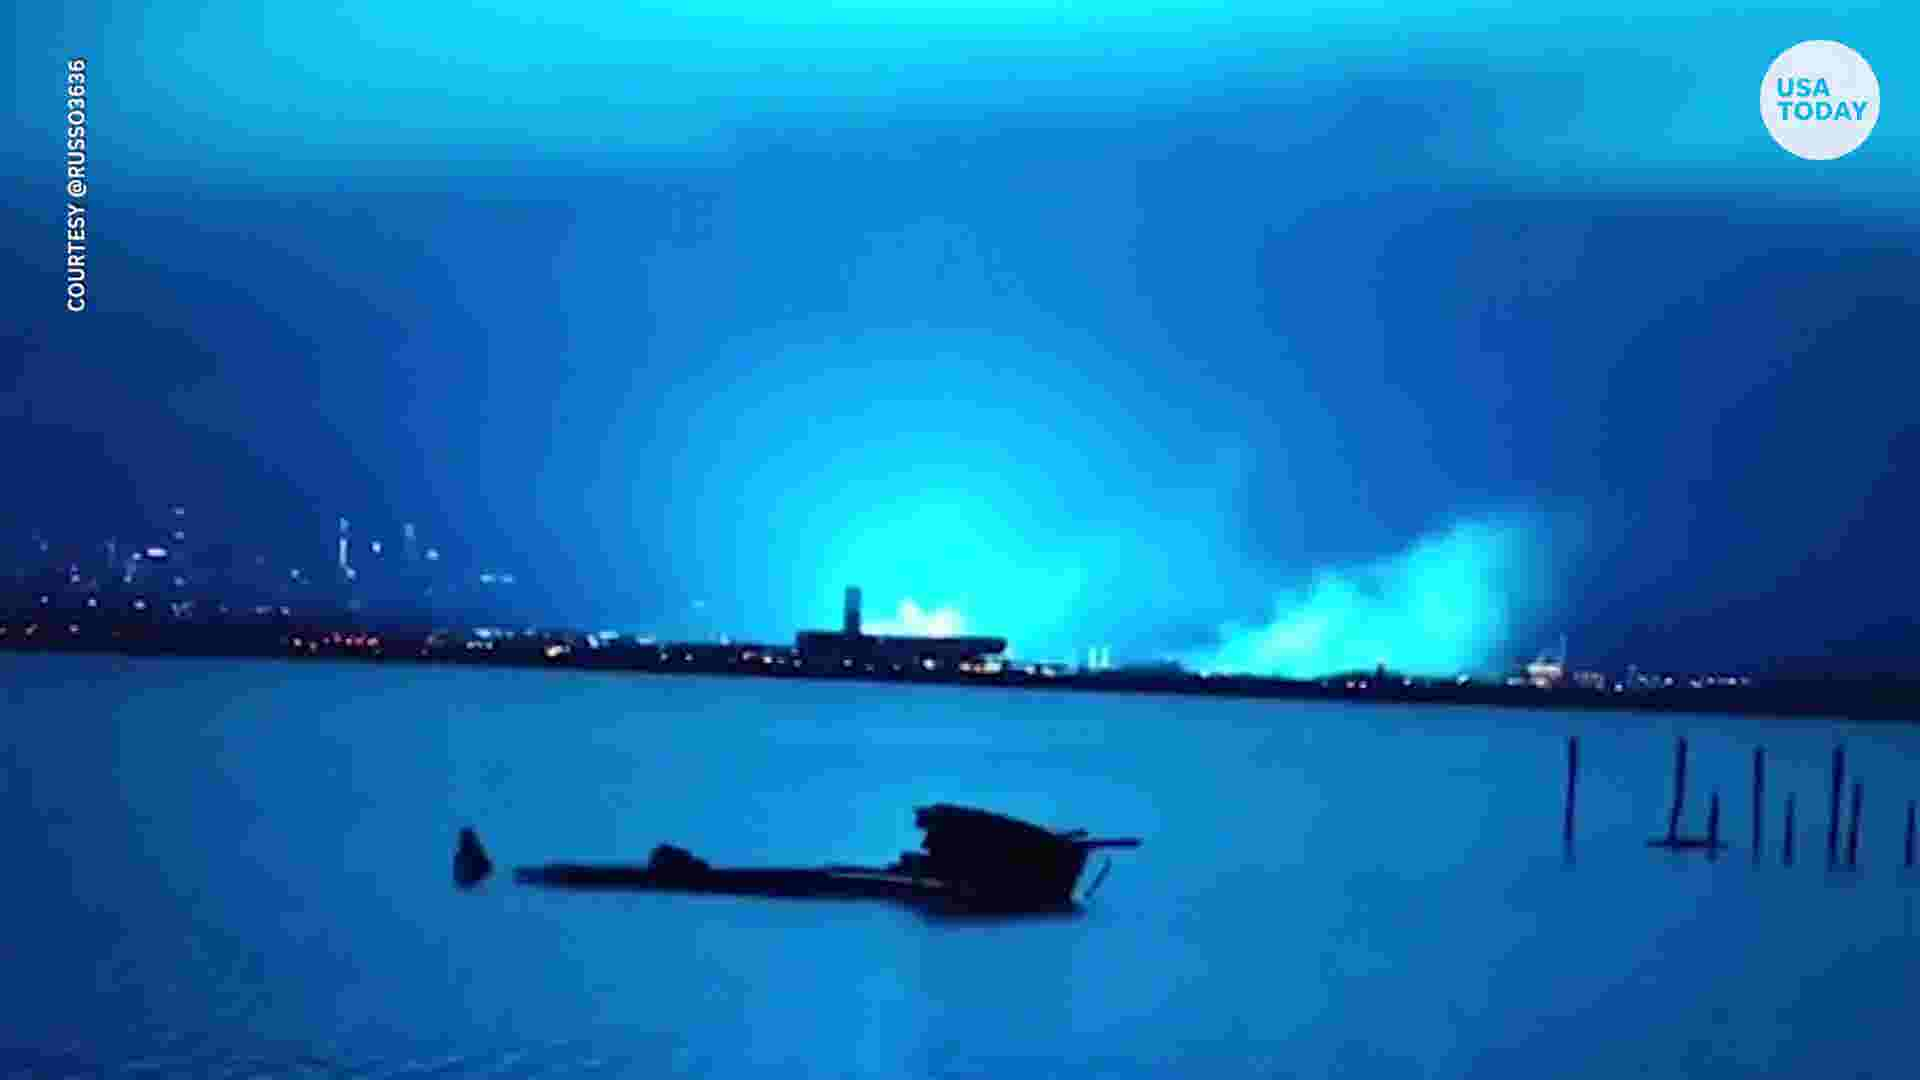 Power Plant Explosion Turns Nyc Night Sky Bright Blue